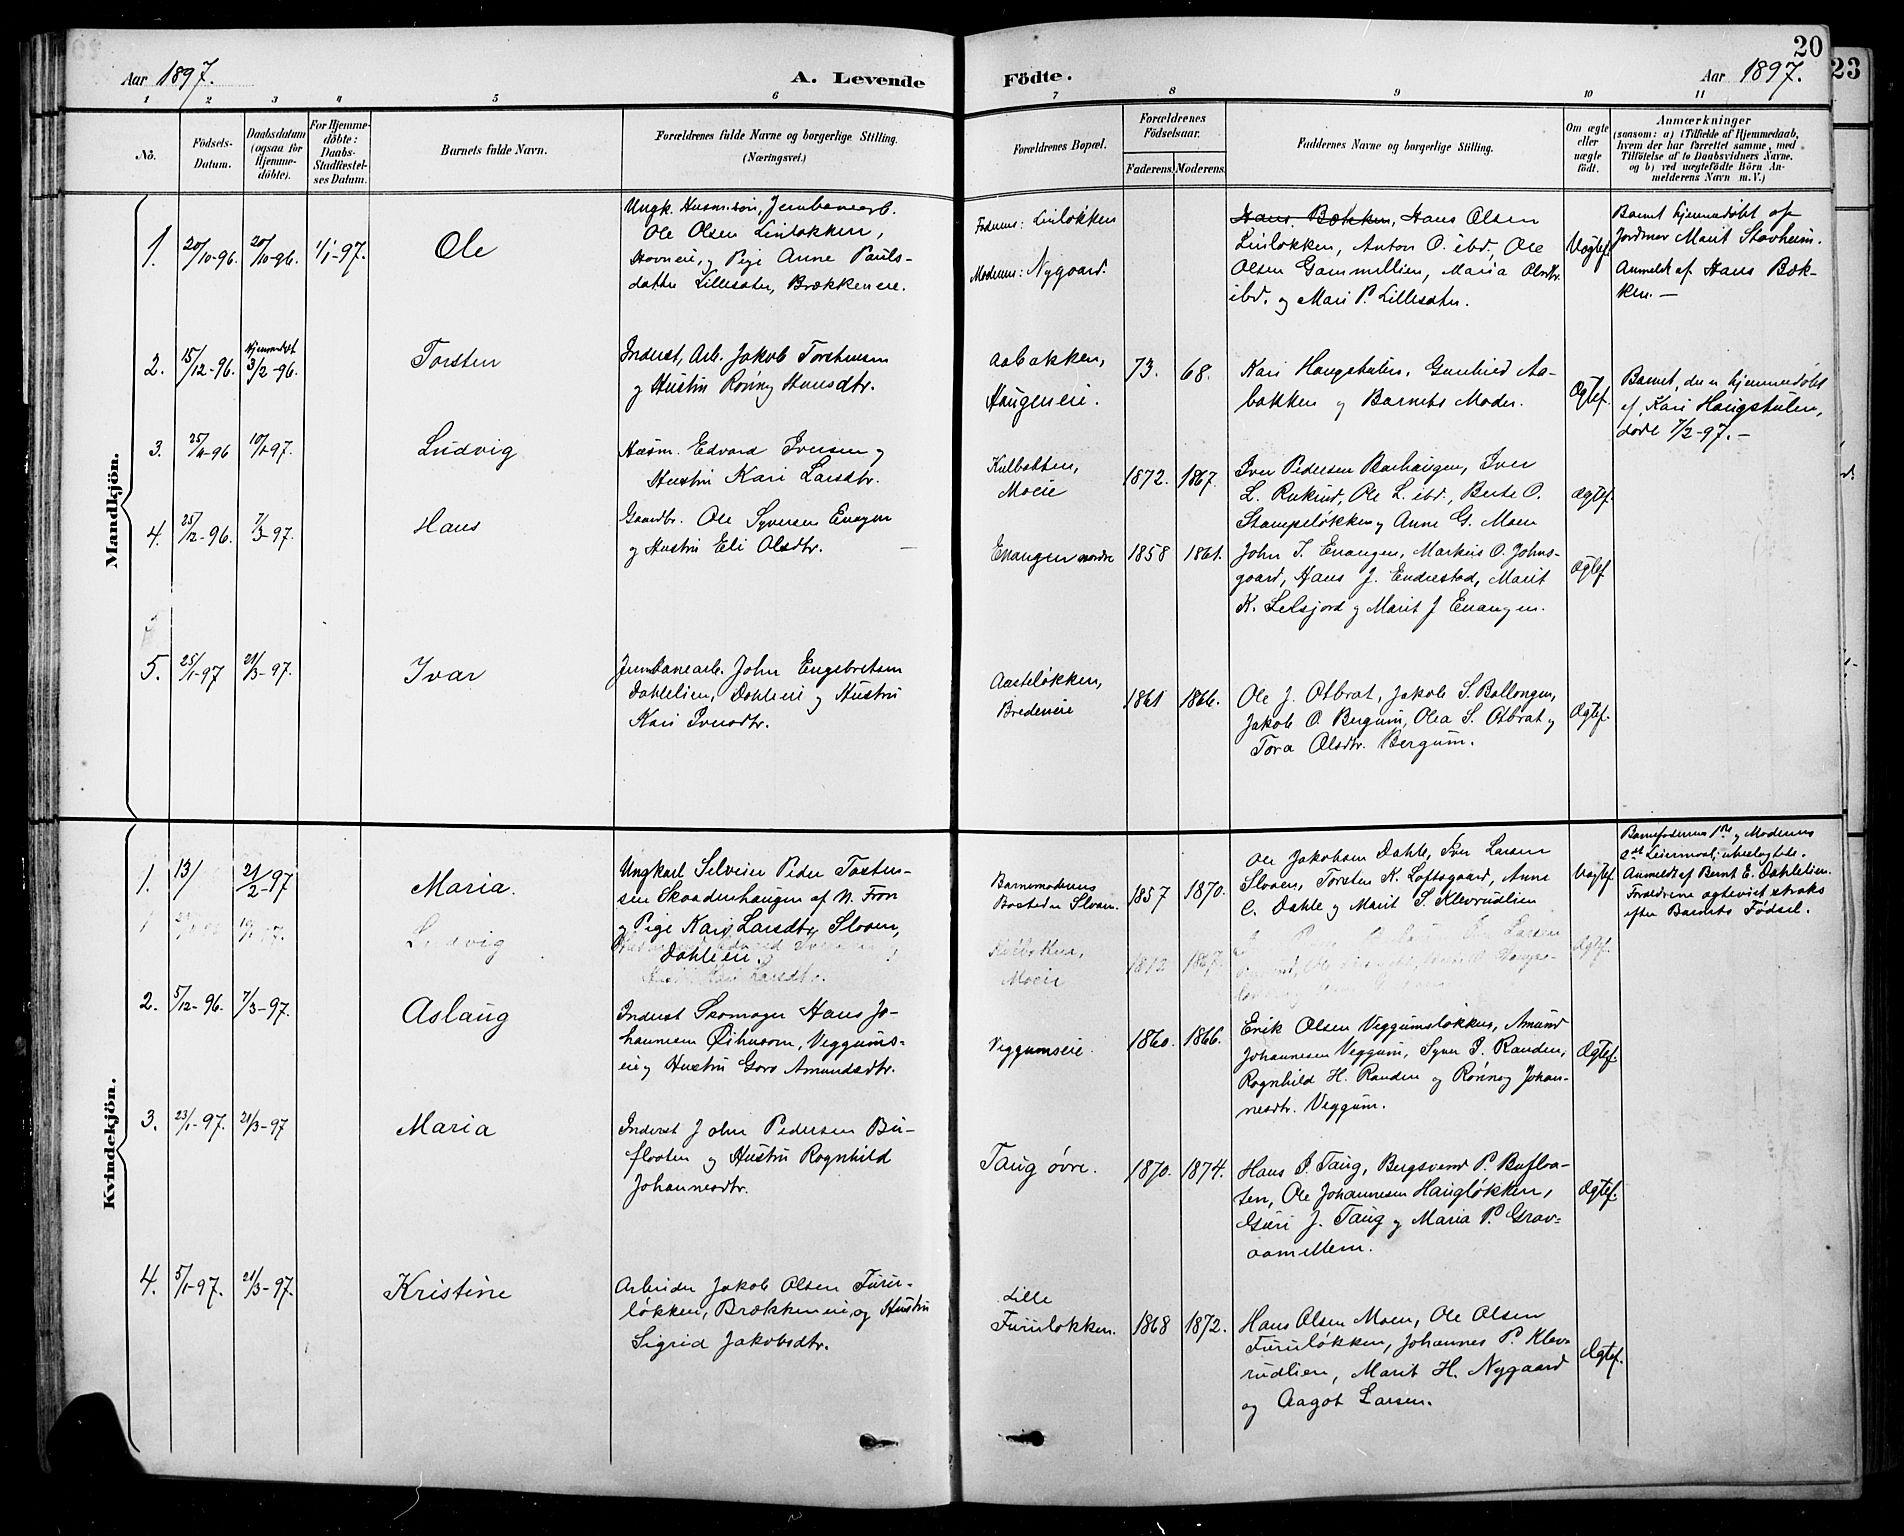 SAH, Sel prestekontor, Klokkerbok nr. 1, 1894-1923, s. 20